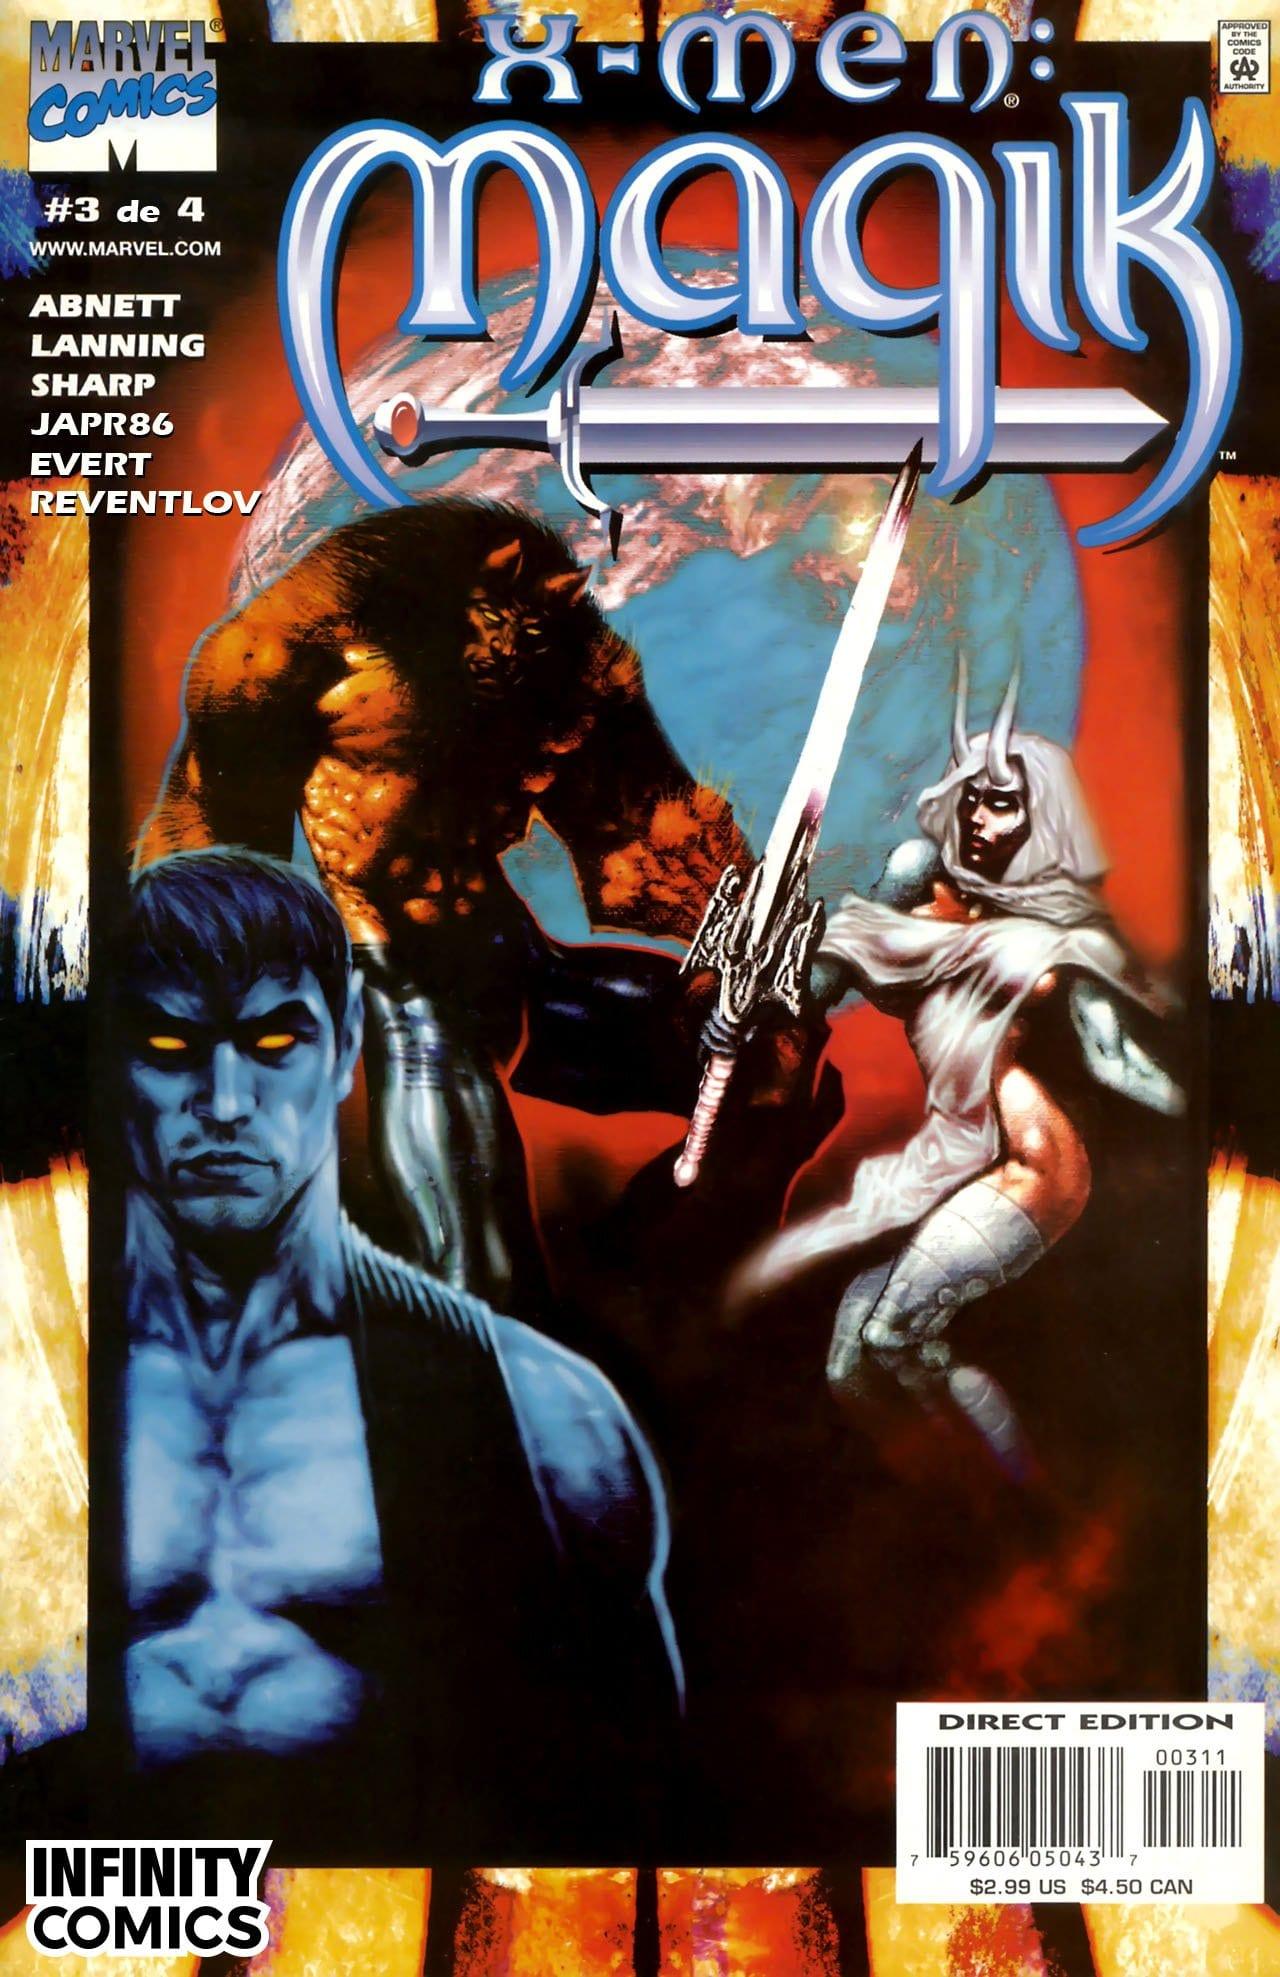 Comic completo X-Men: Magik volumen 2